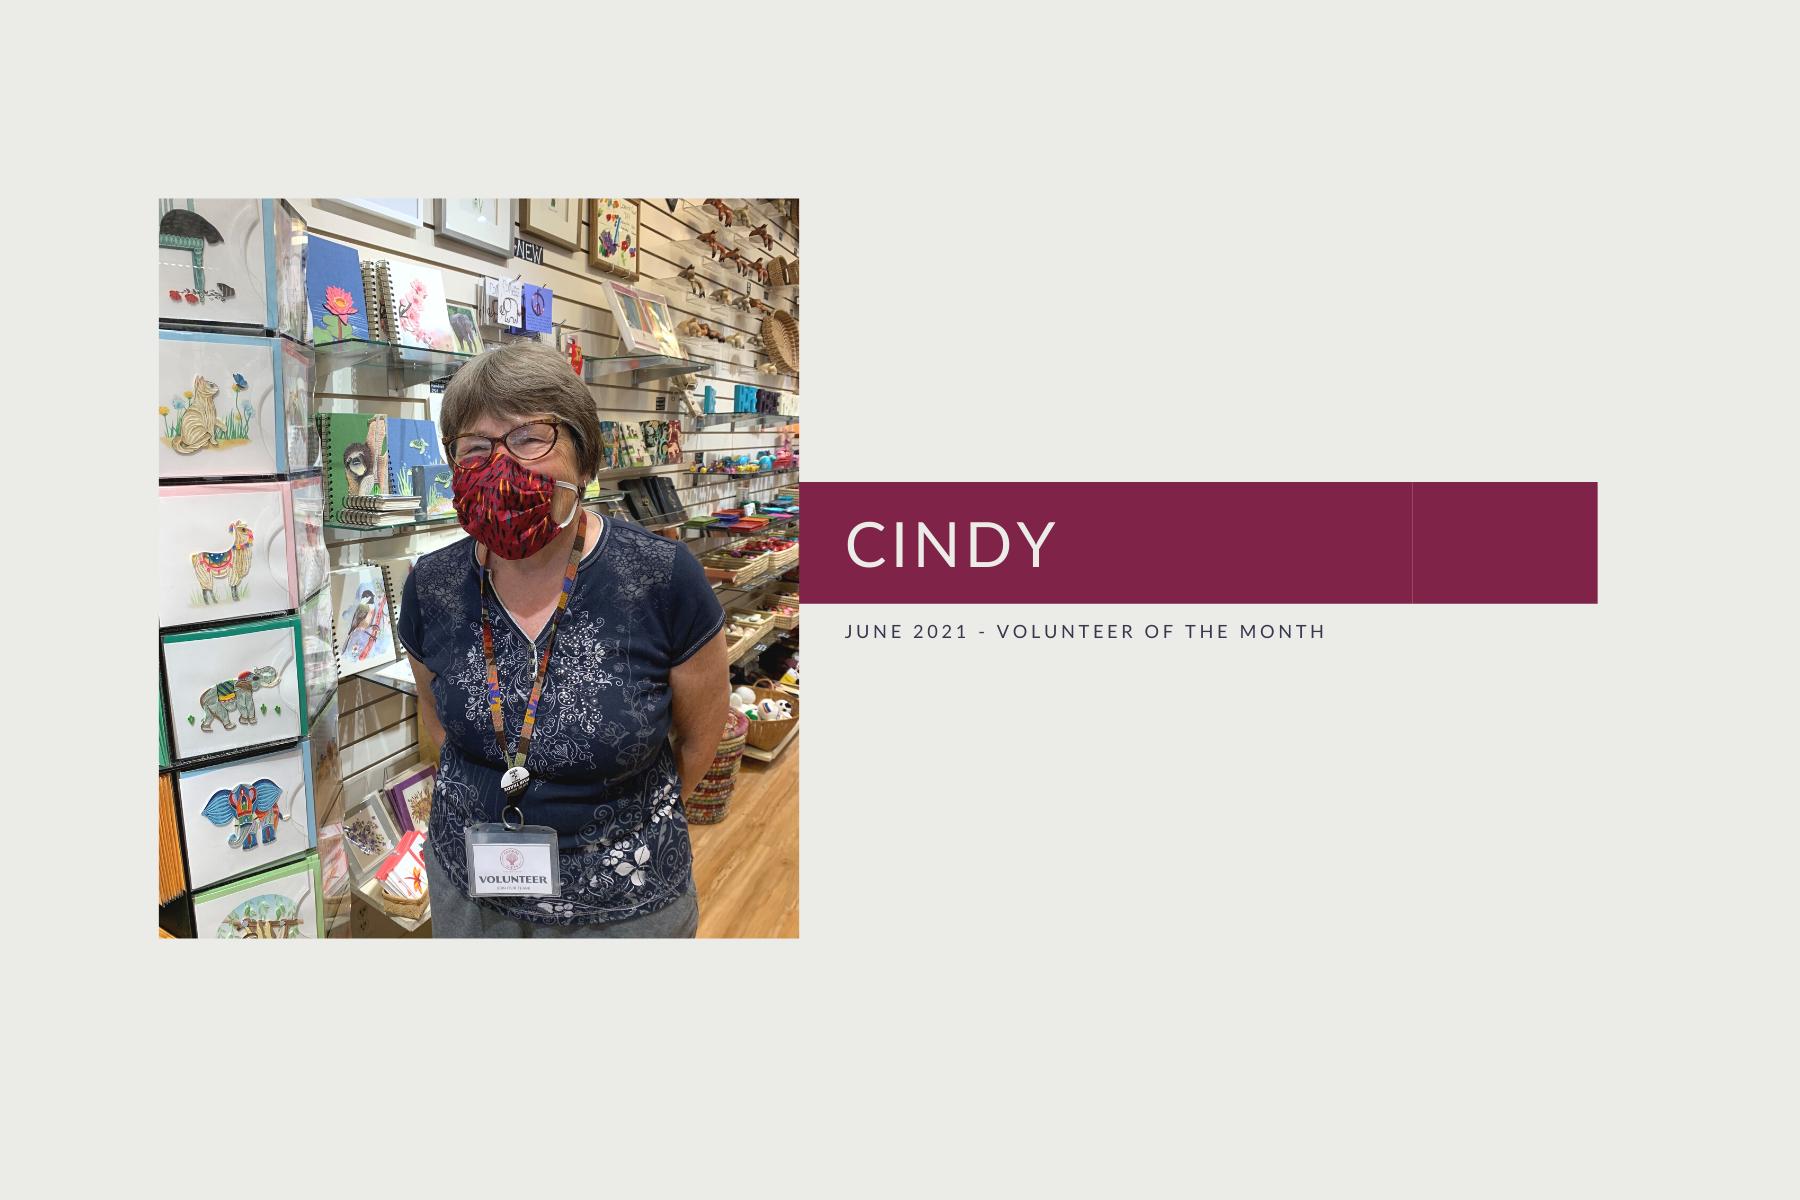 Meet Cindy: Volunteer of the Month (June 2021)